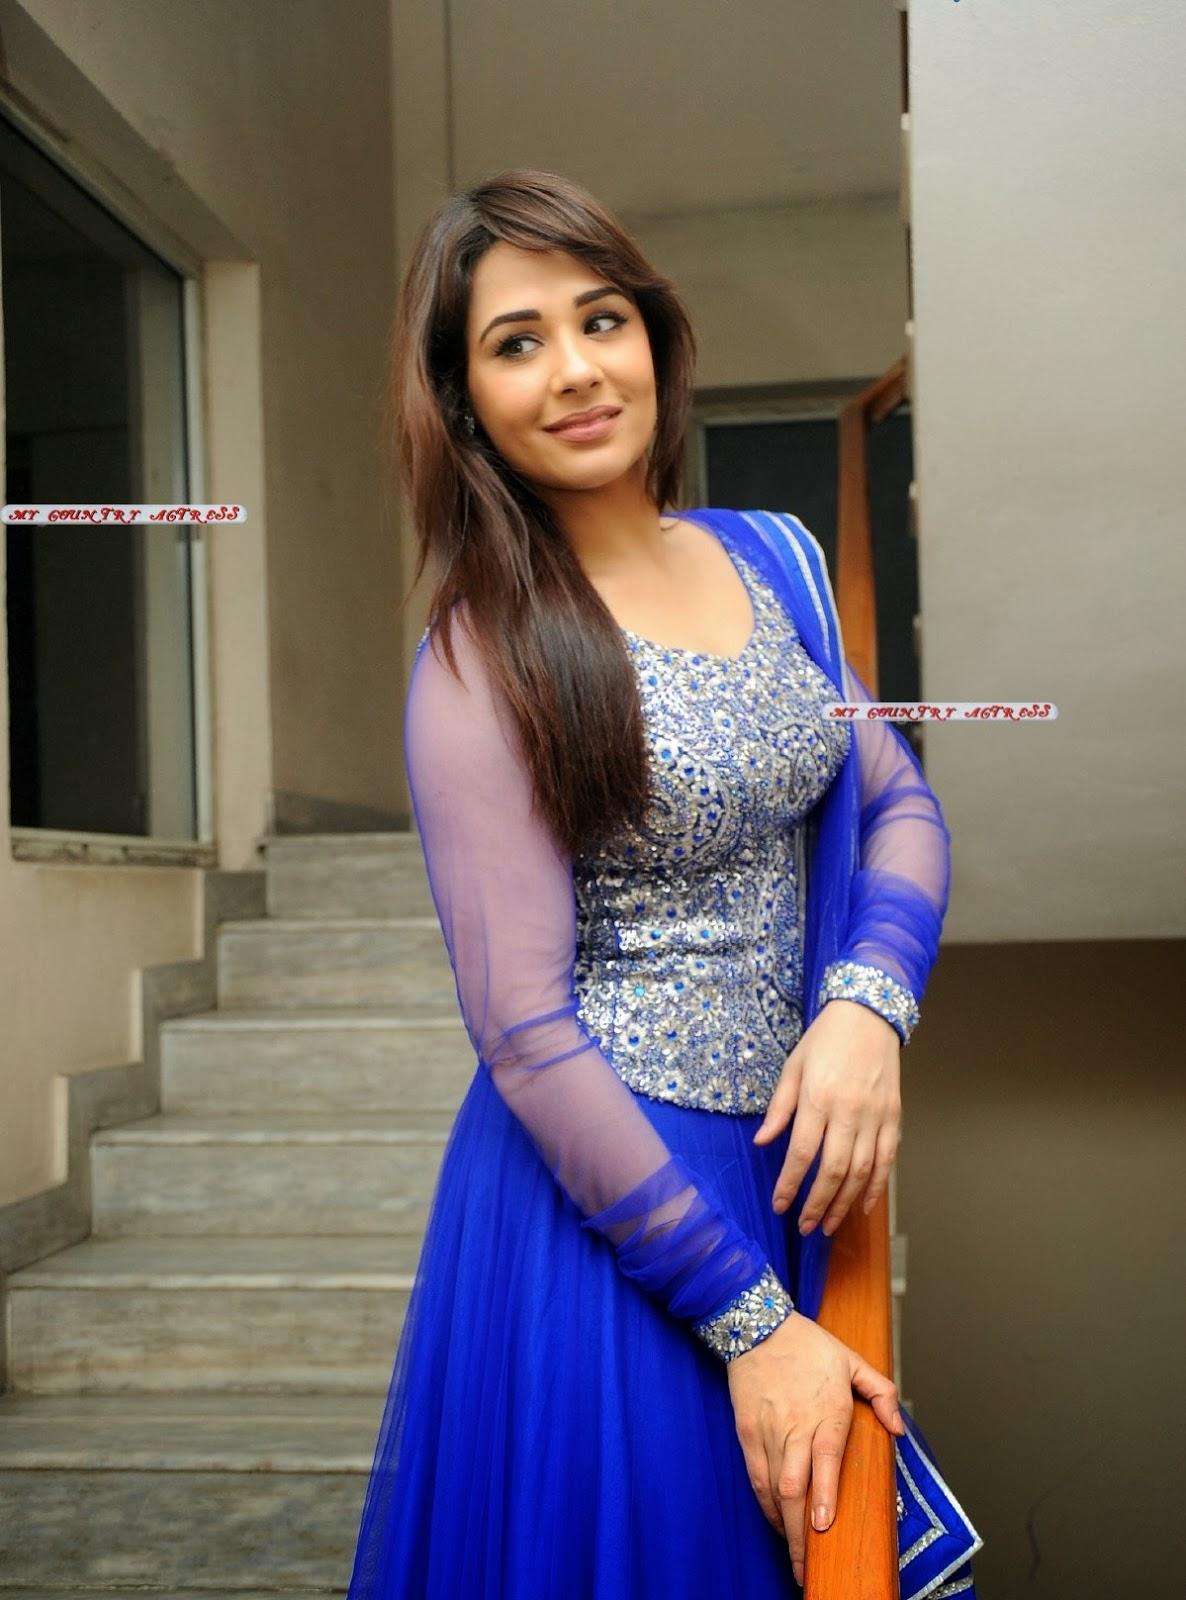 biriyani movie  actress mandy takhar photos